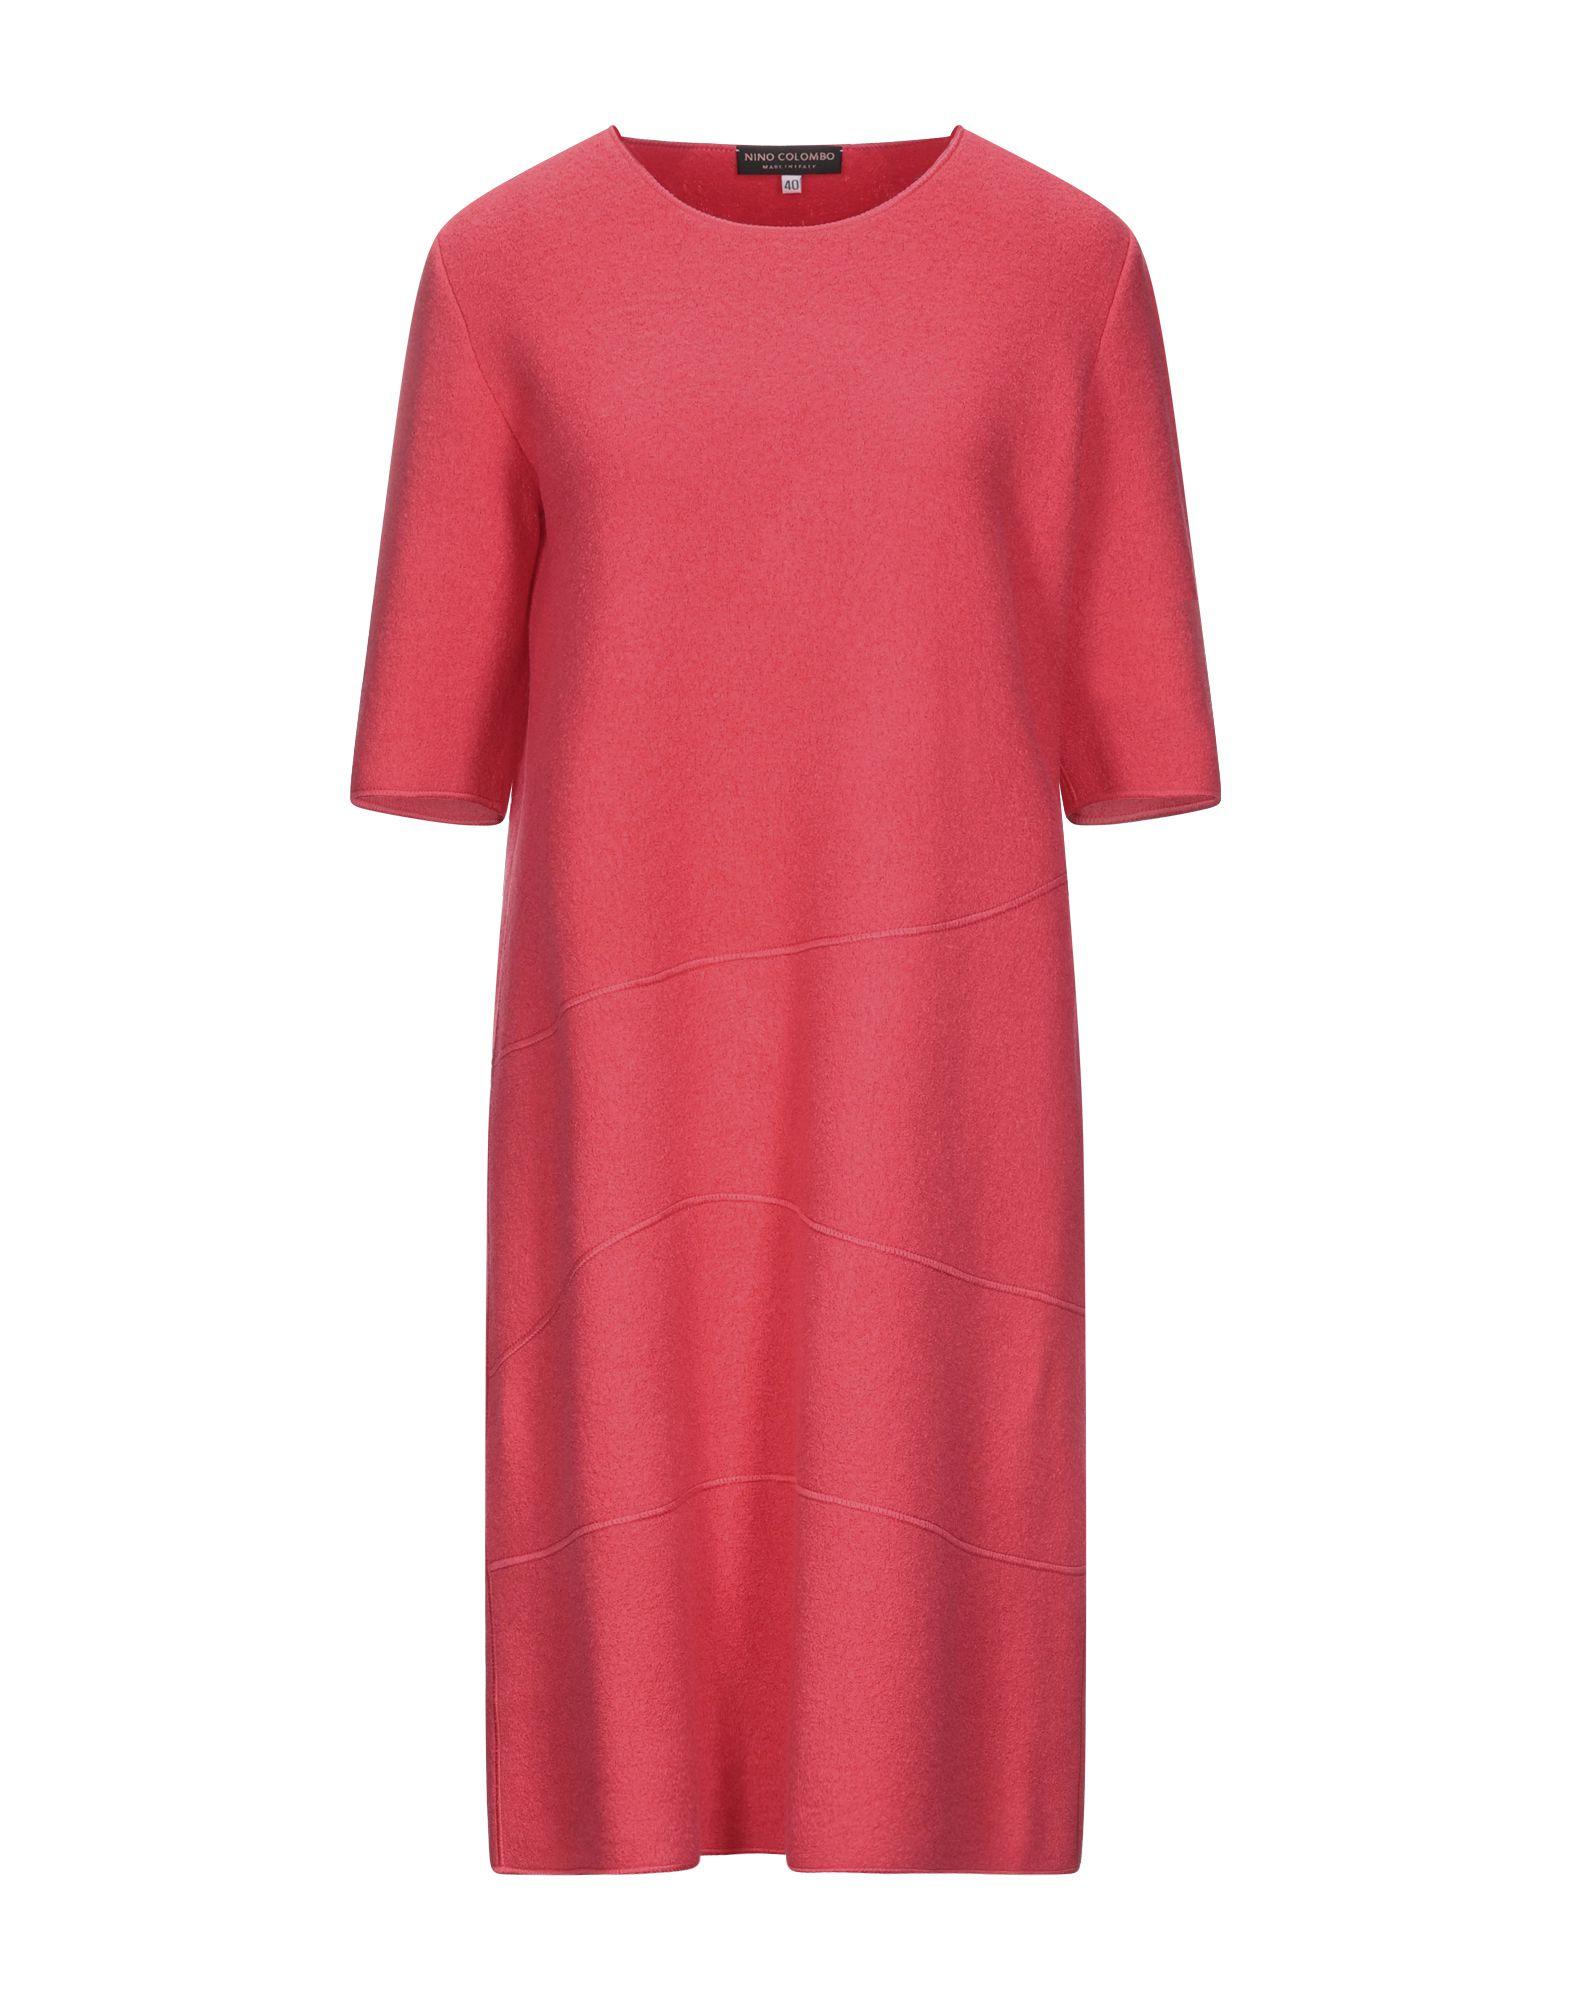 NINO COLOMBO Платье до колена